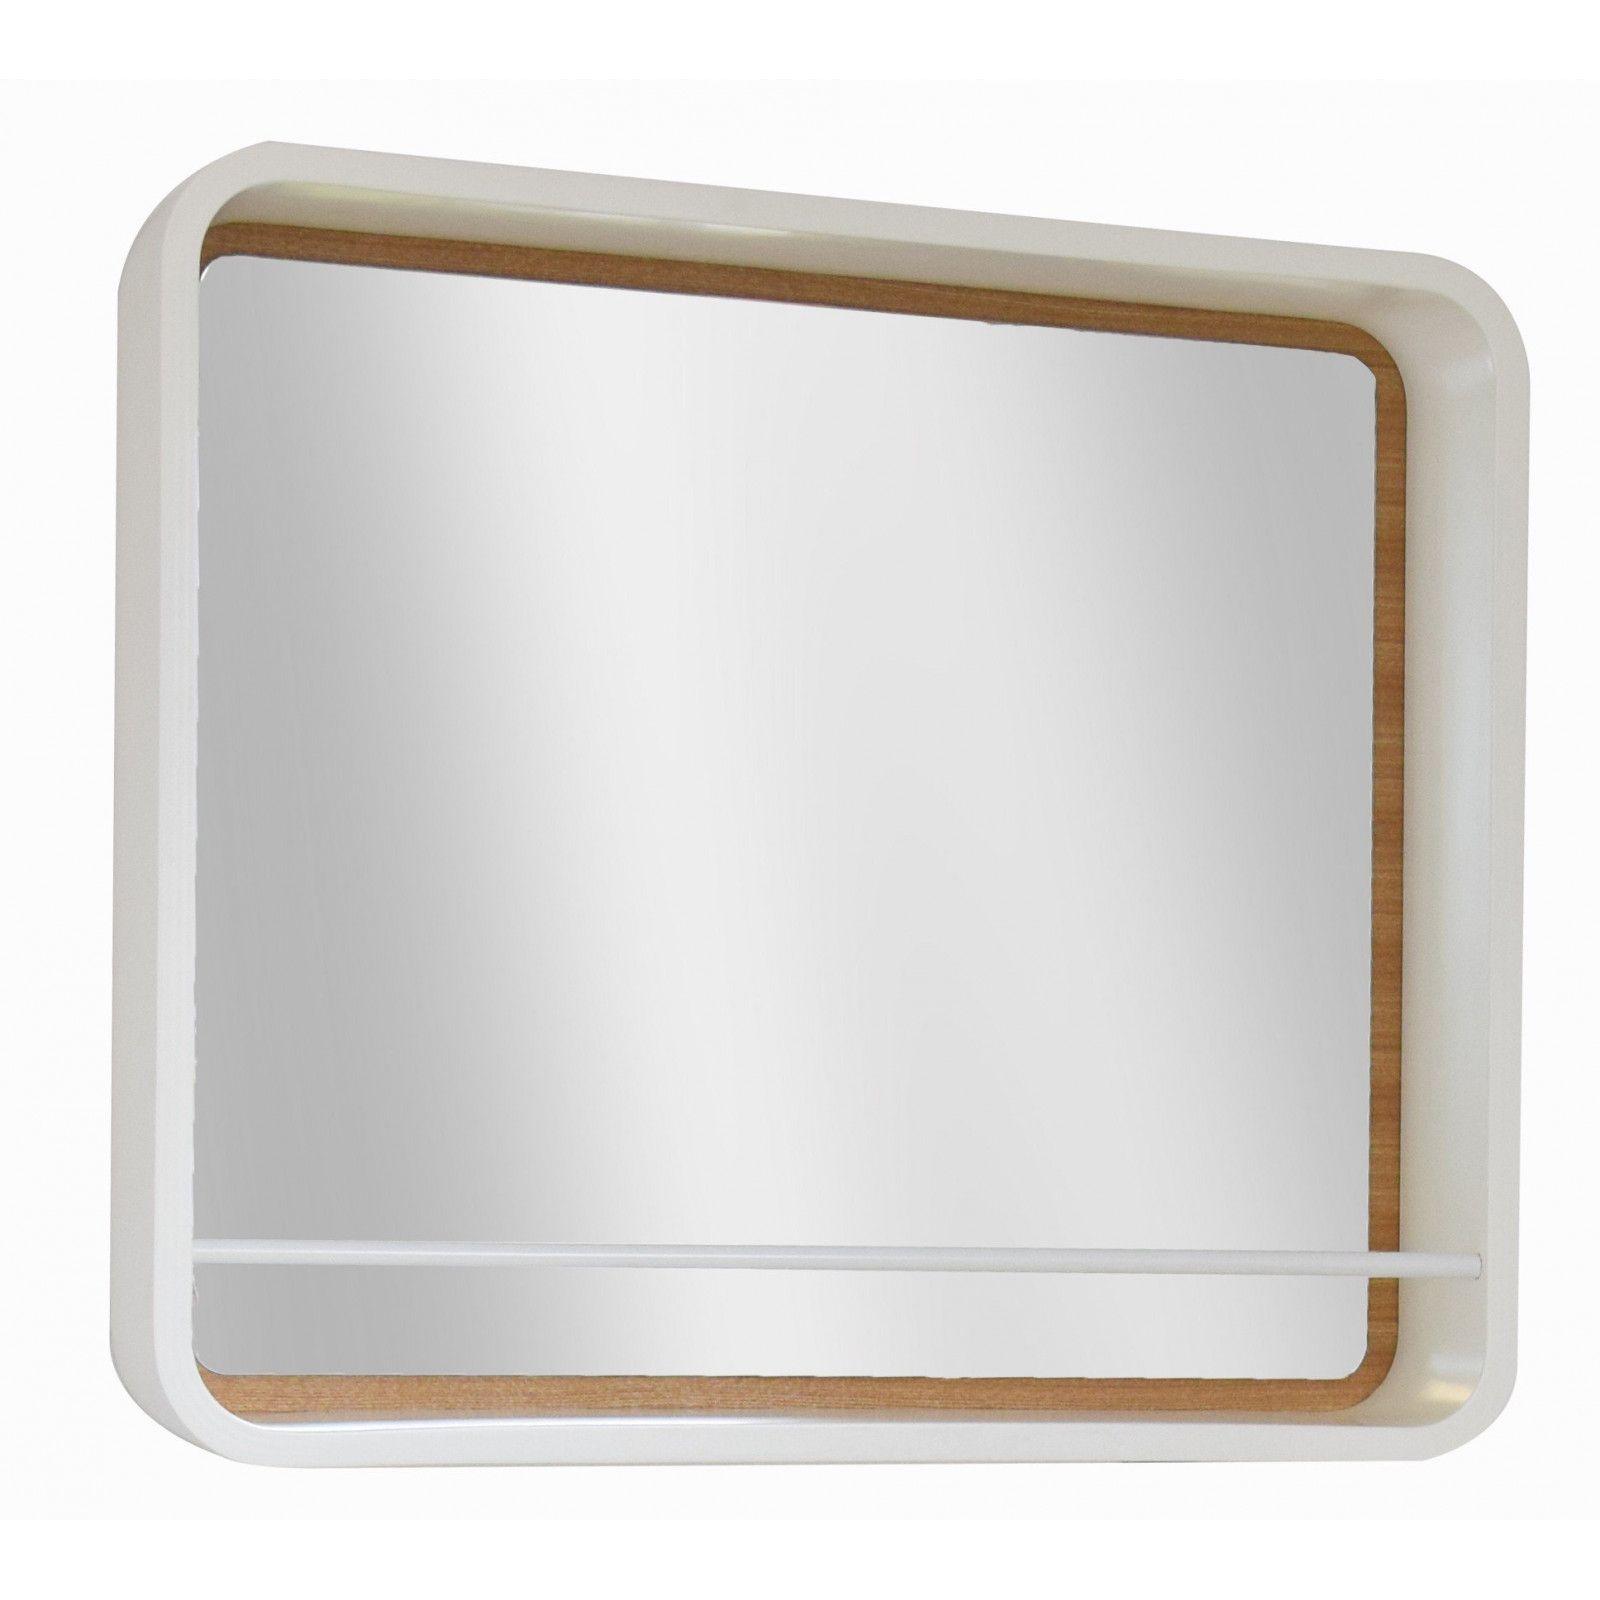 Miroir de SDB H60 x L70 + support étagère LATTA